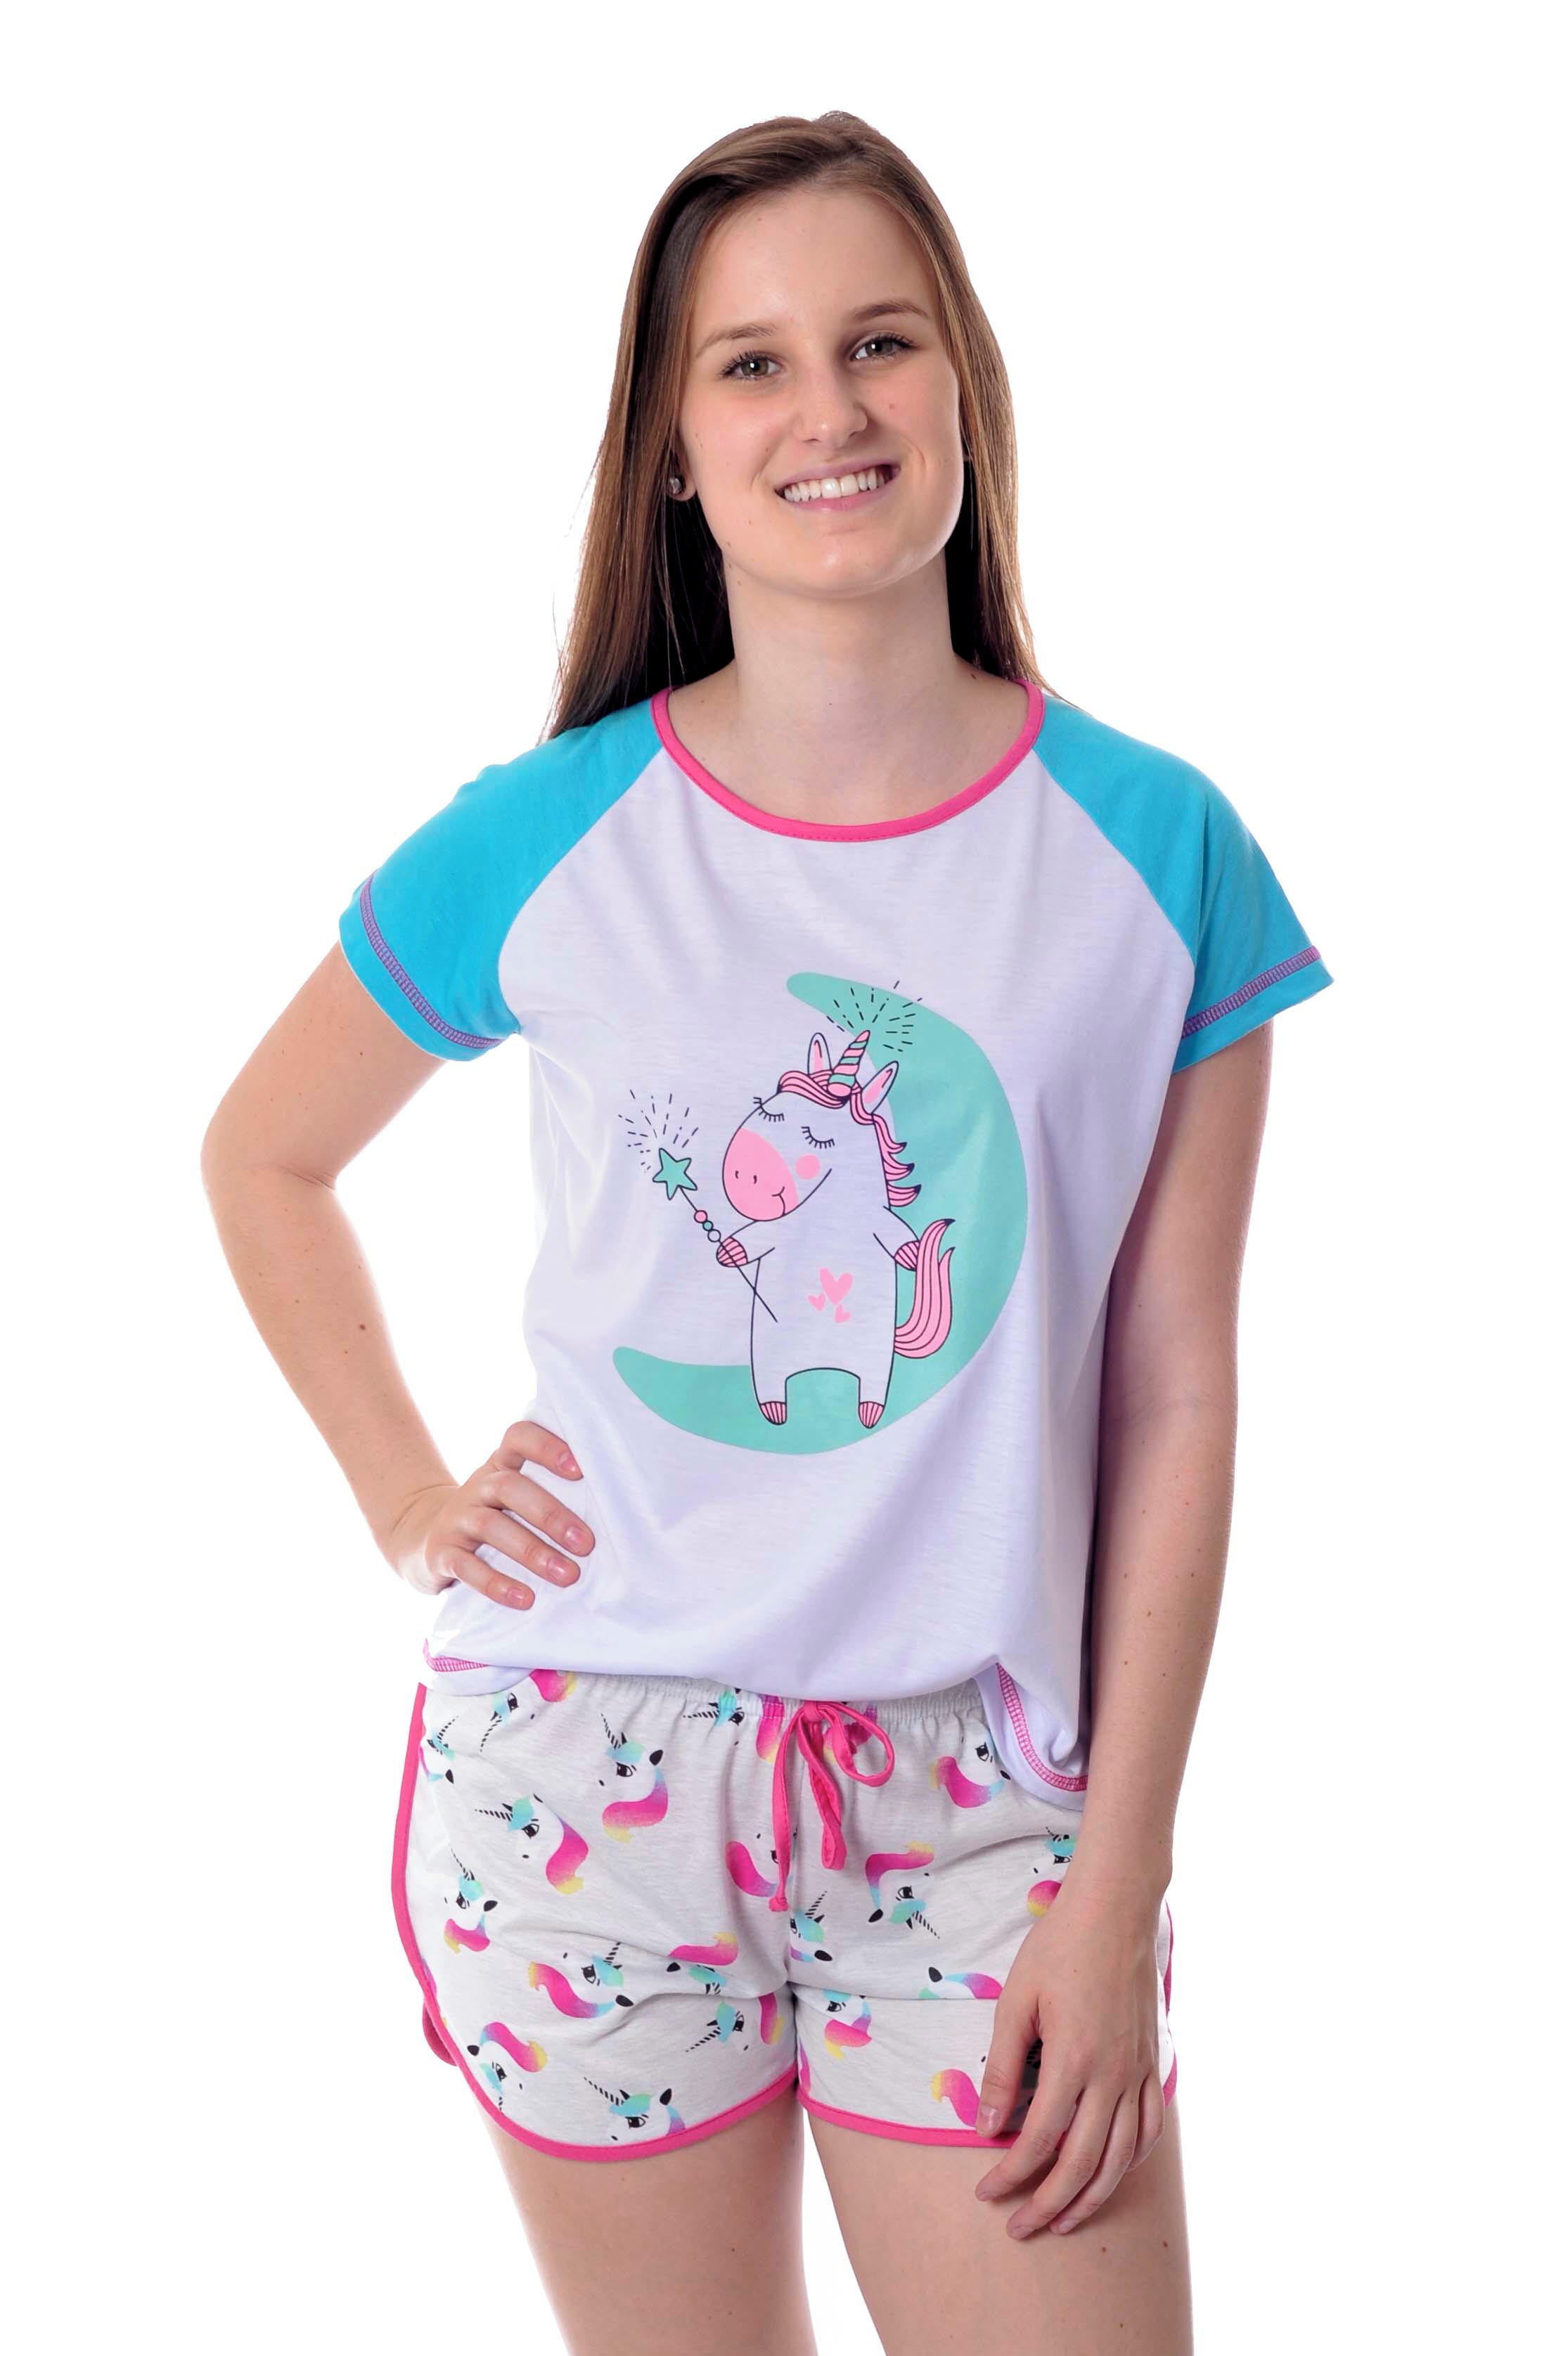 ccf2506354d255 Pijama de Unicornio Feminino Adulto Short Doll | Elo7